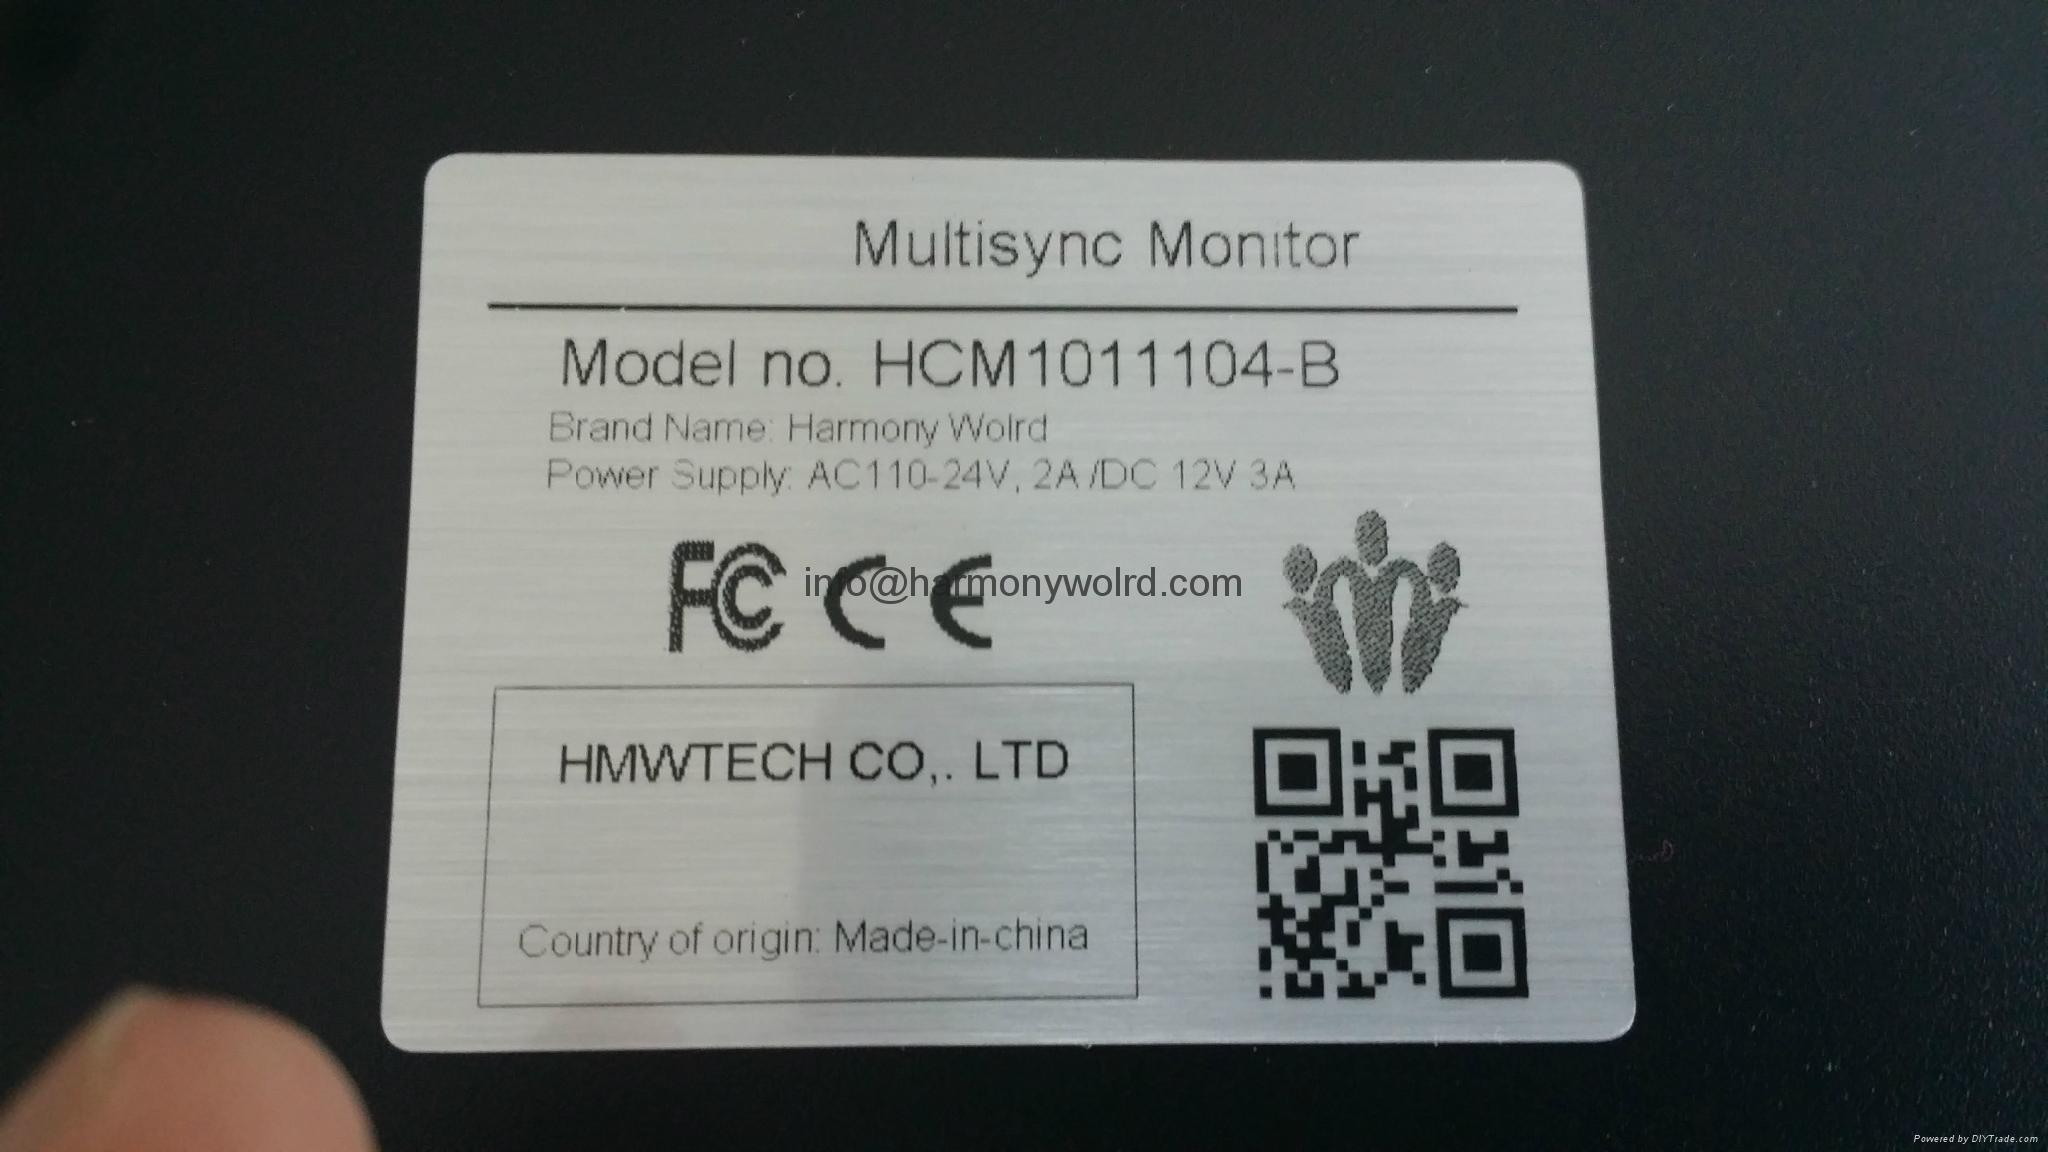 Upgrade Hitachi Seiki Monitor nm1231a11 nm1231a10 nm0129 nm-0135 siicrt 01-14-00 6